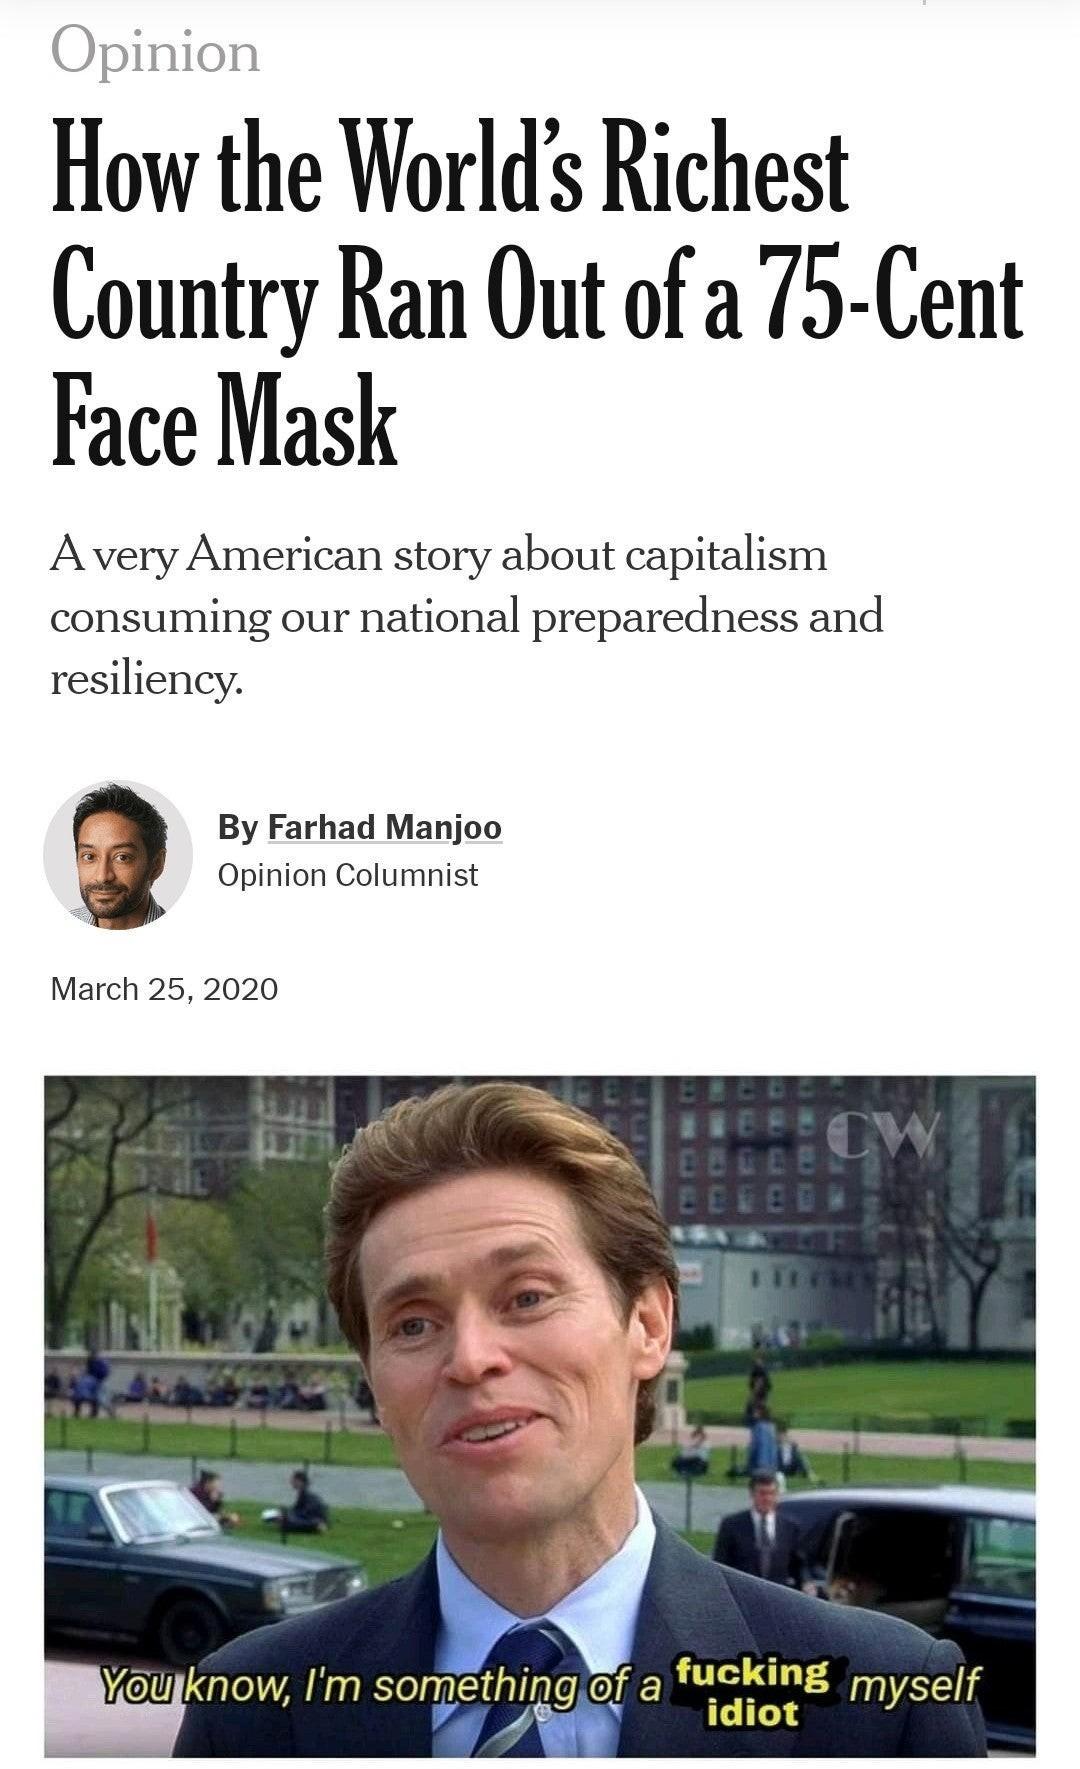 A fucking idiot - meme